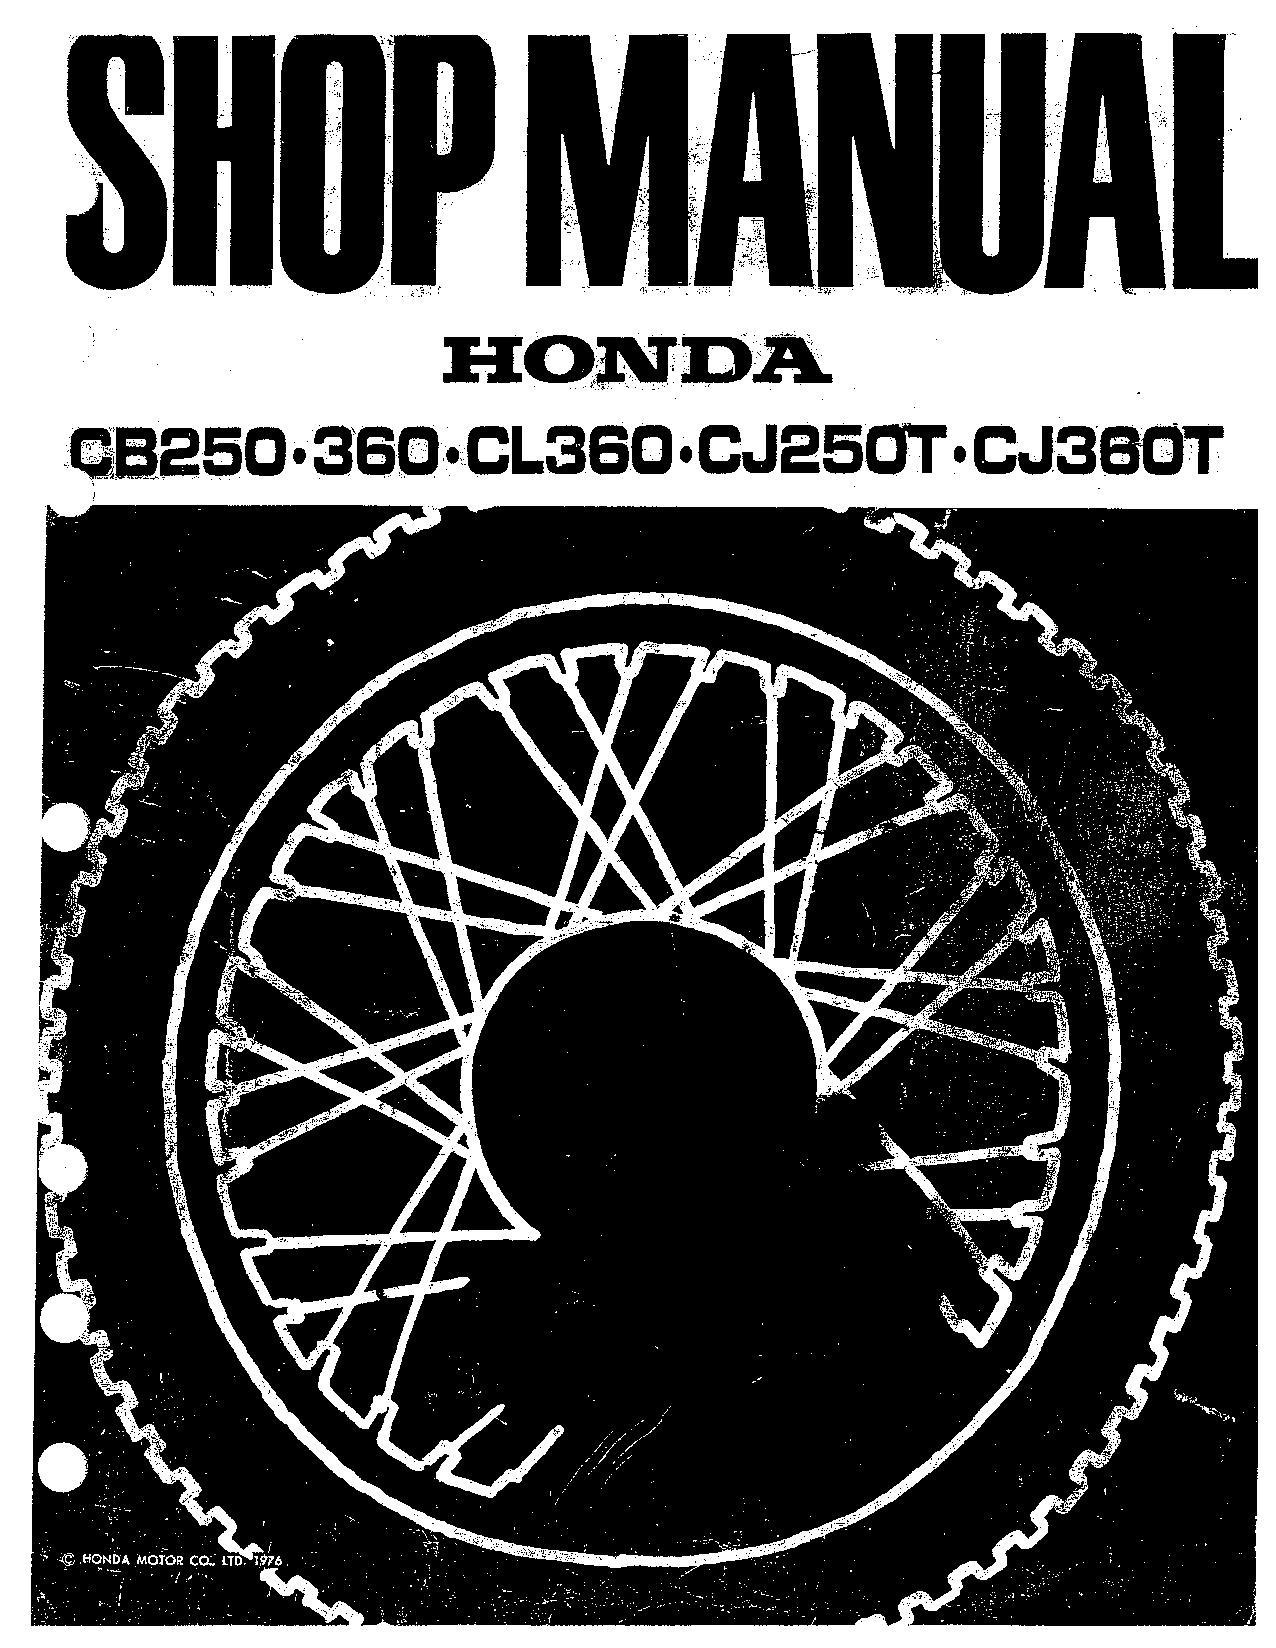 File Honda Cb250 Cb360 Cl360 Cj250t Cj360t Factory Service Manual Pdf Cyclechaos